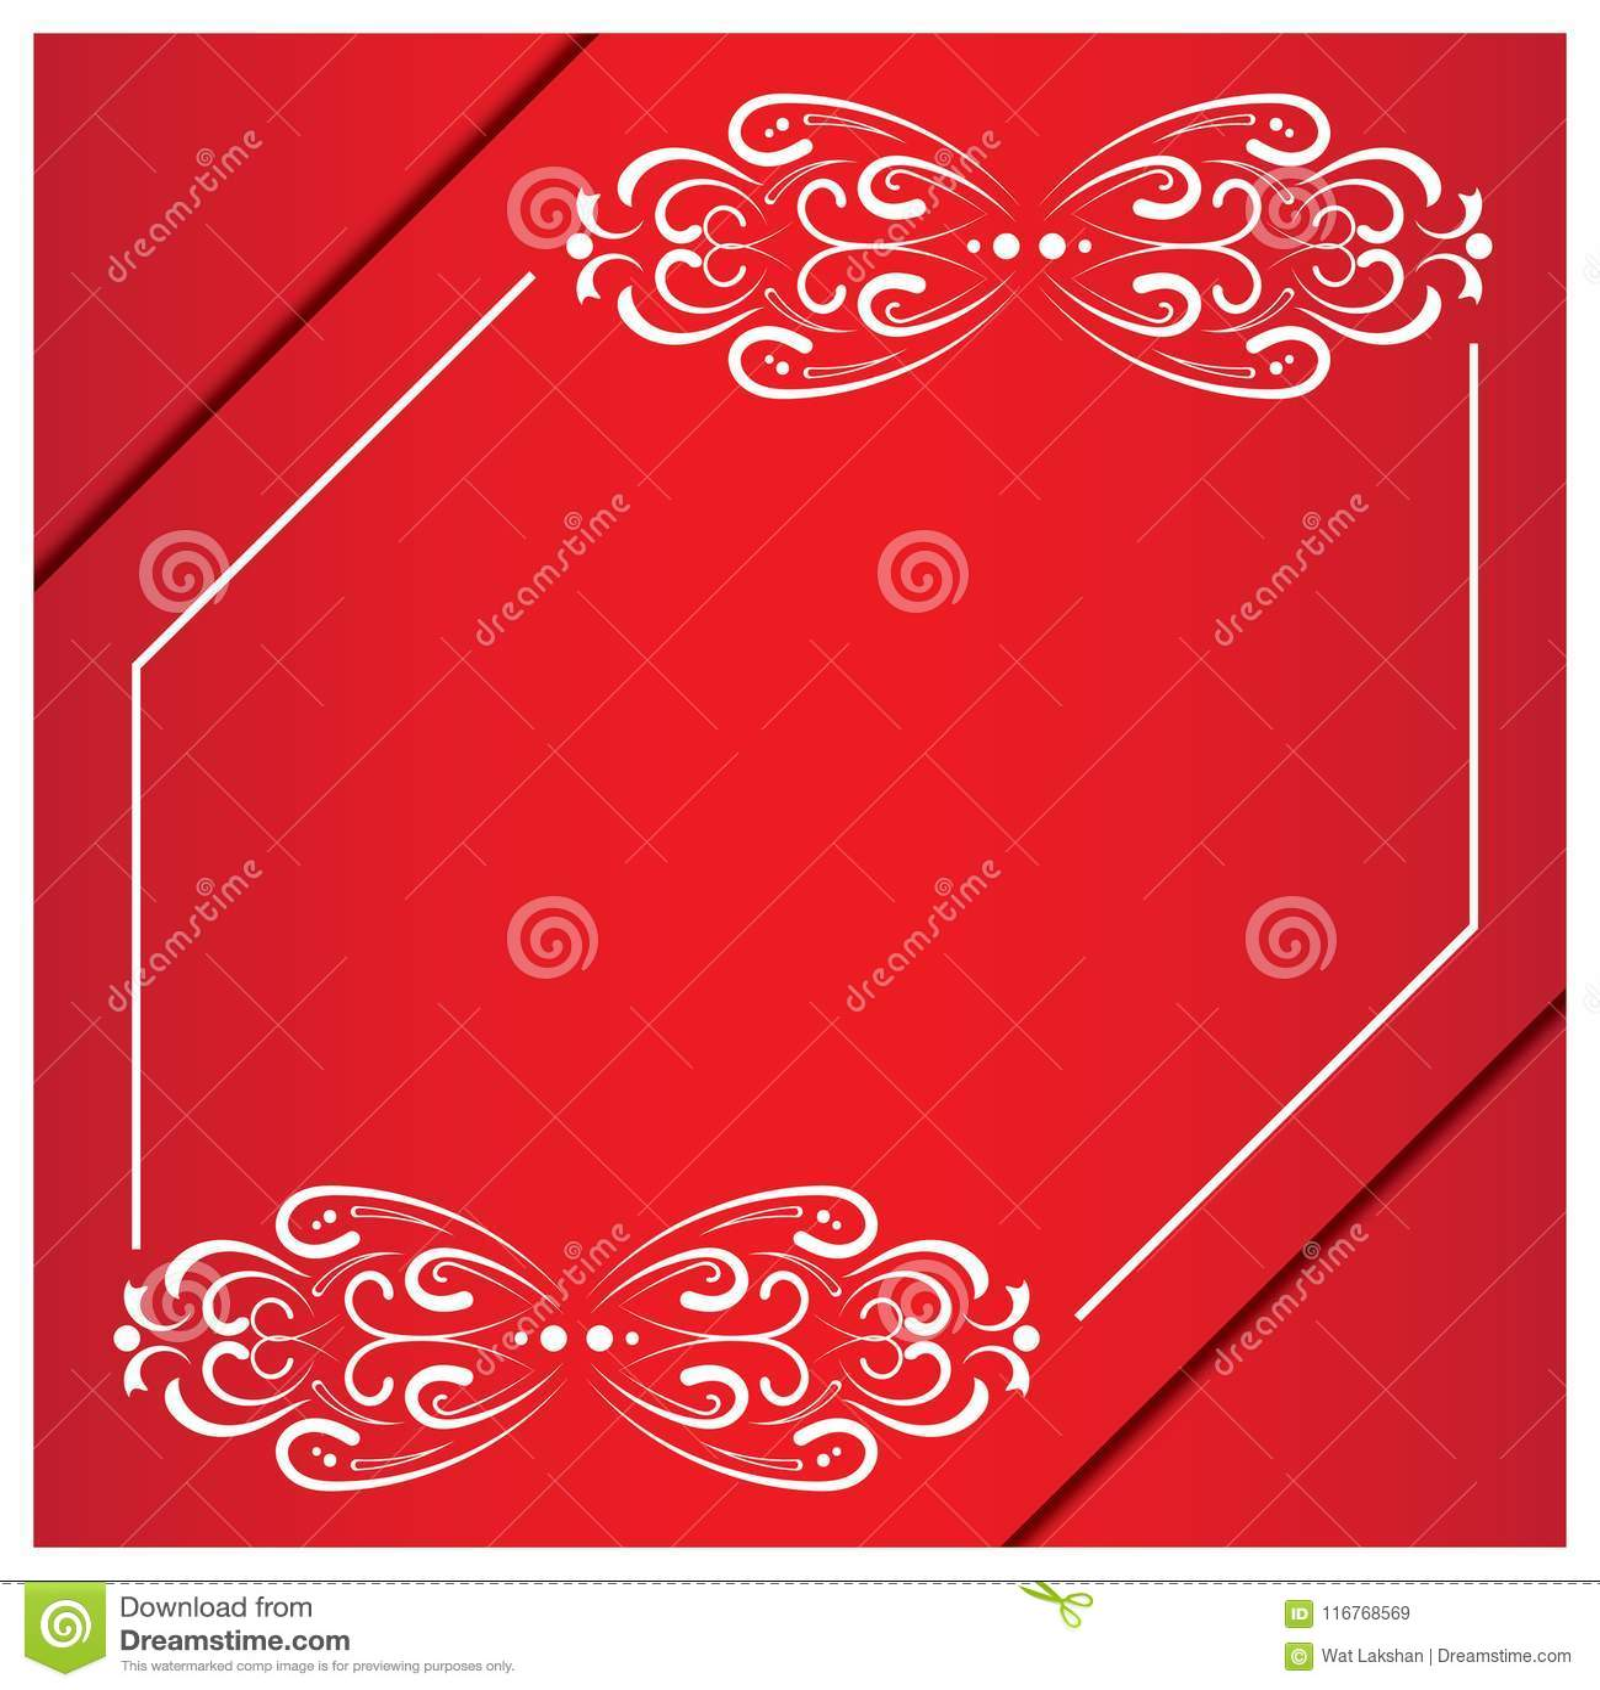 Vintage Wedding Invitation Frames Vector Design Stock Vector ...